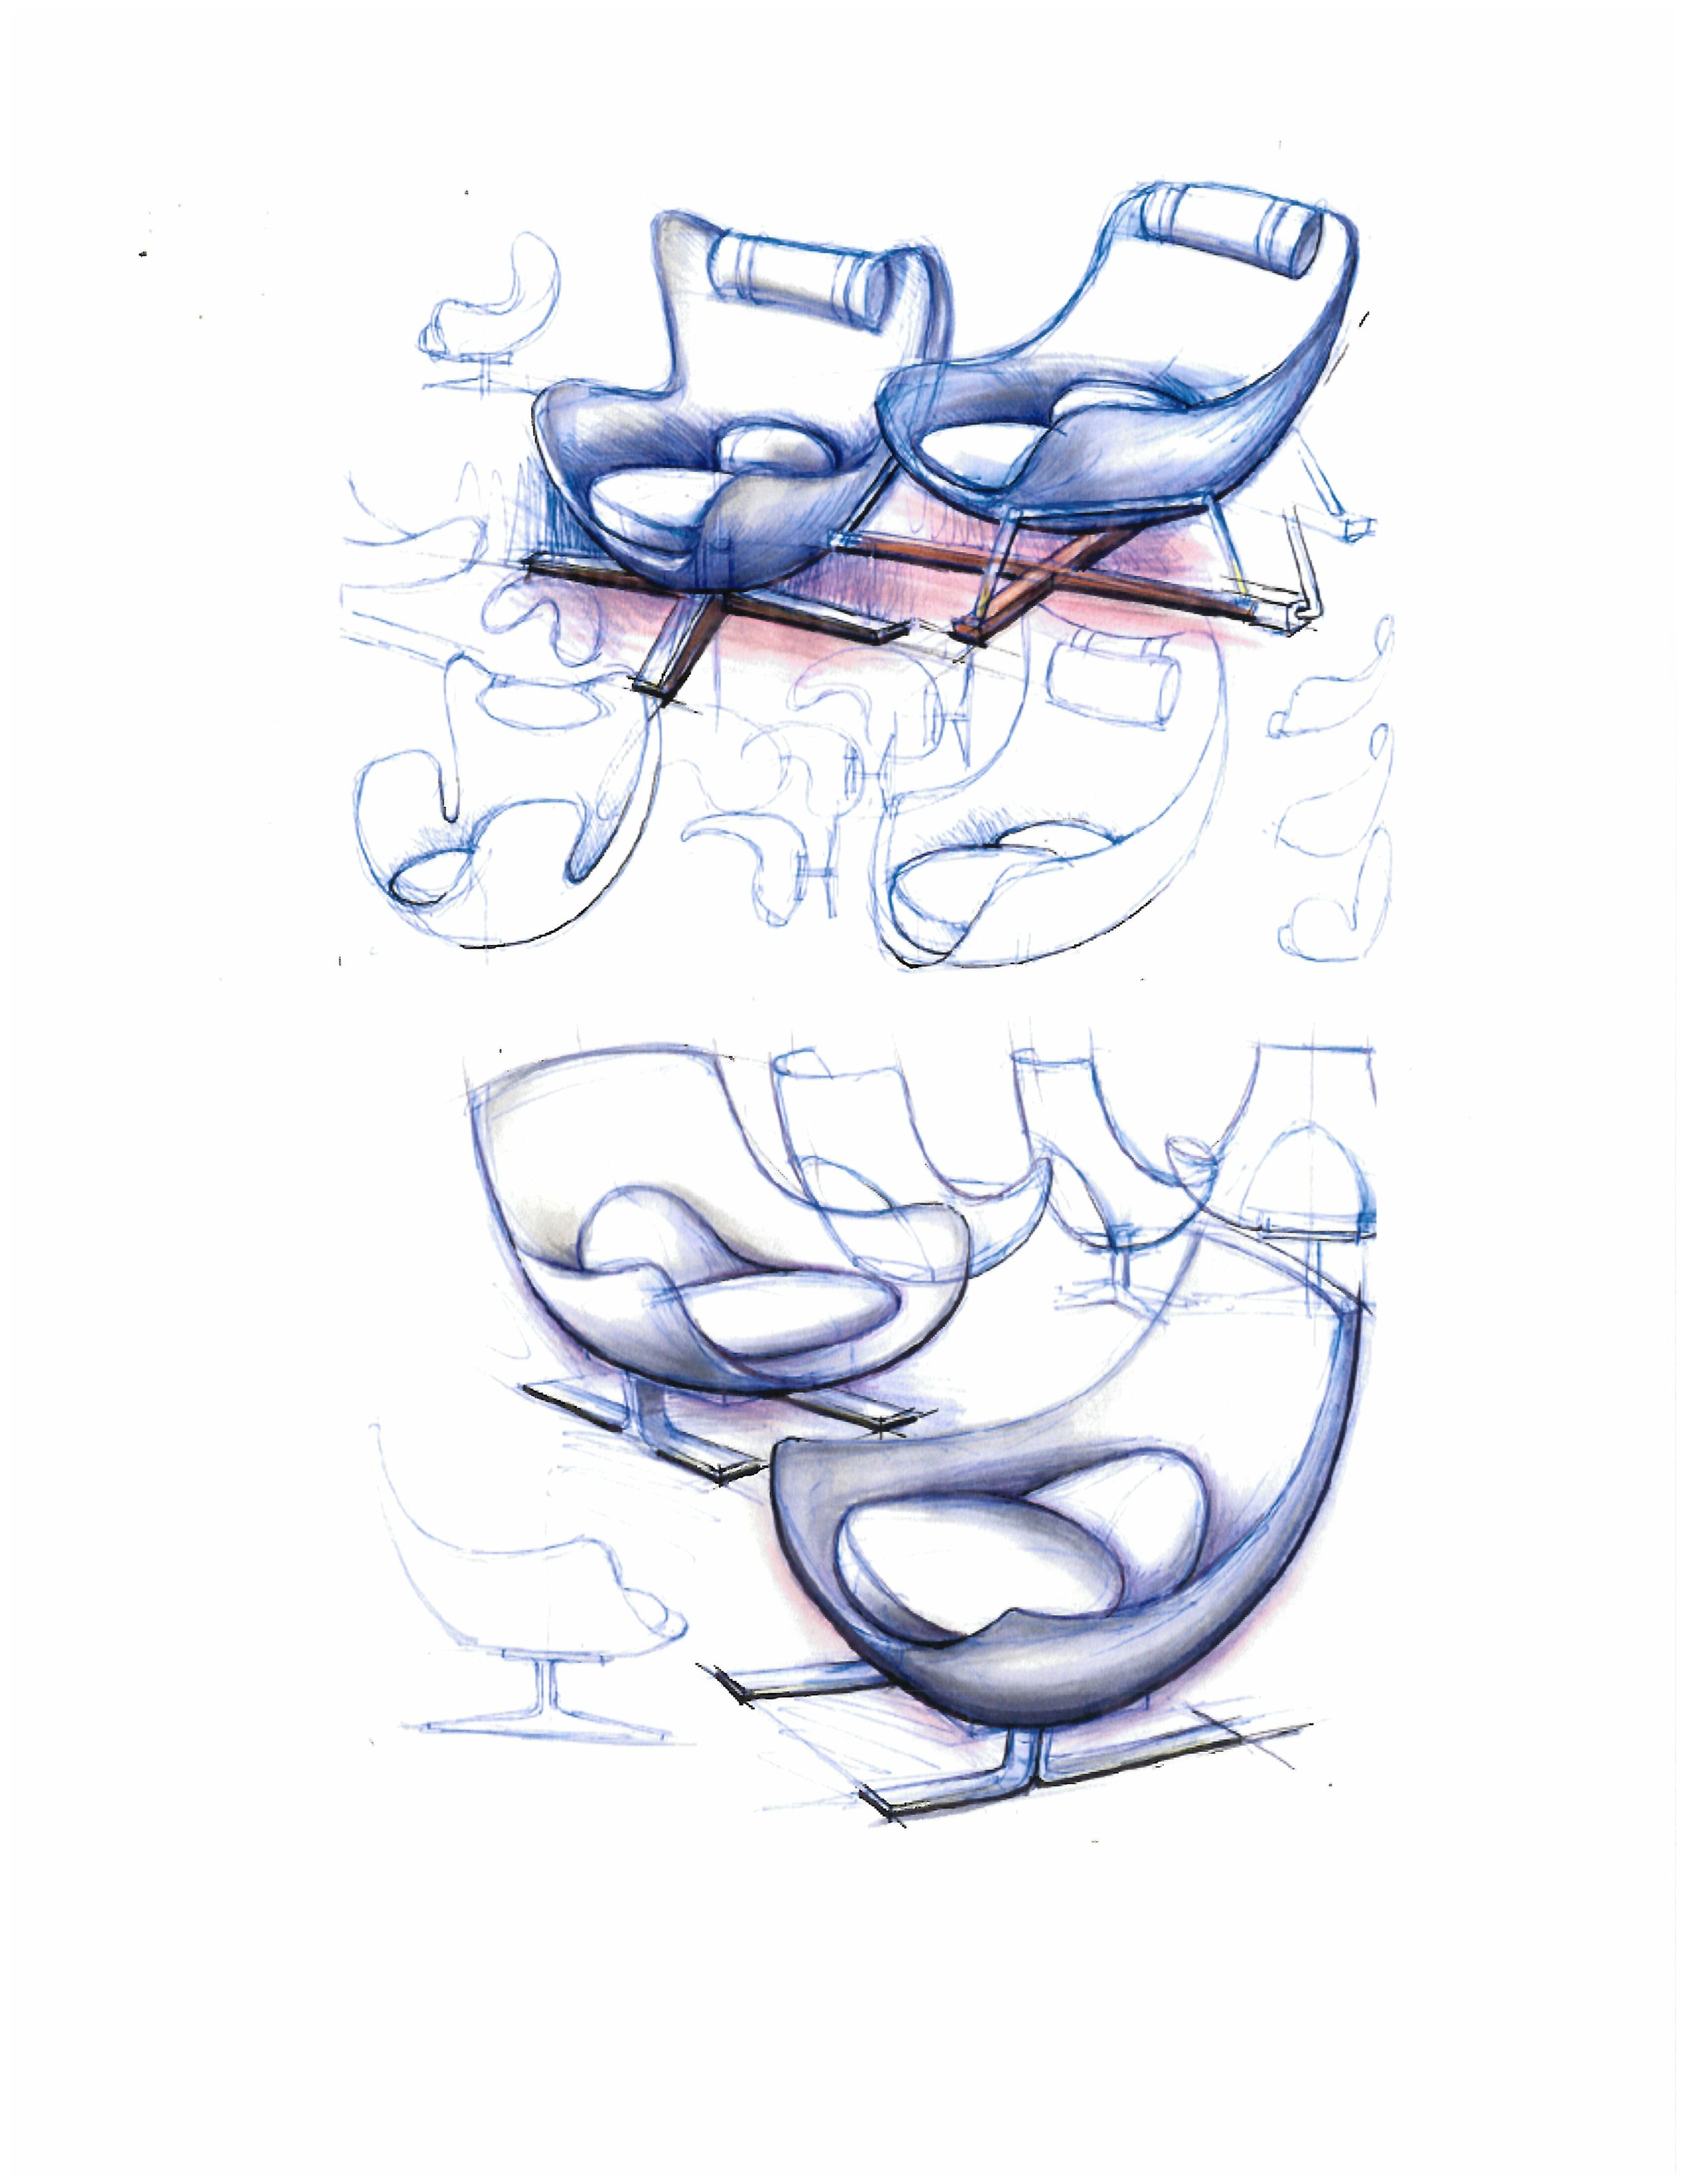 [Untitled]_2-6.jpg